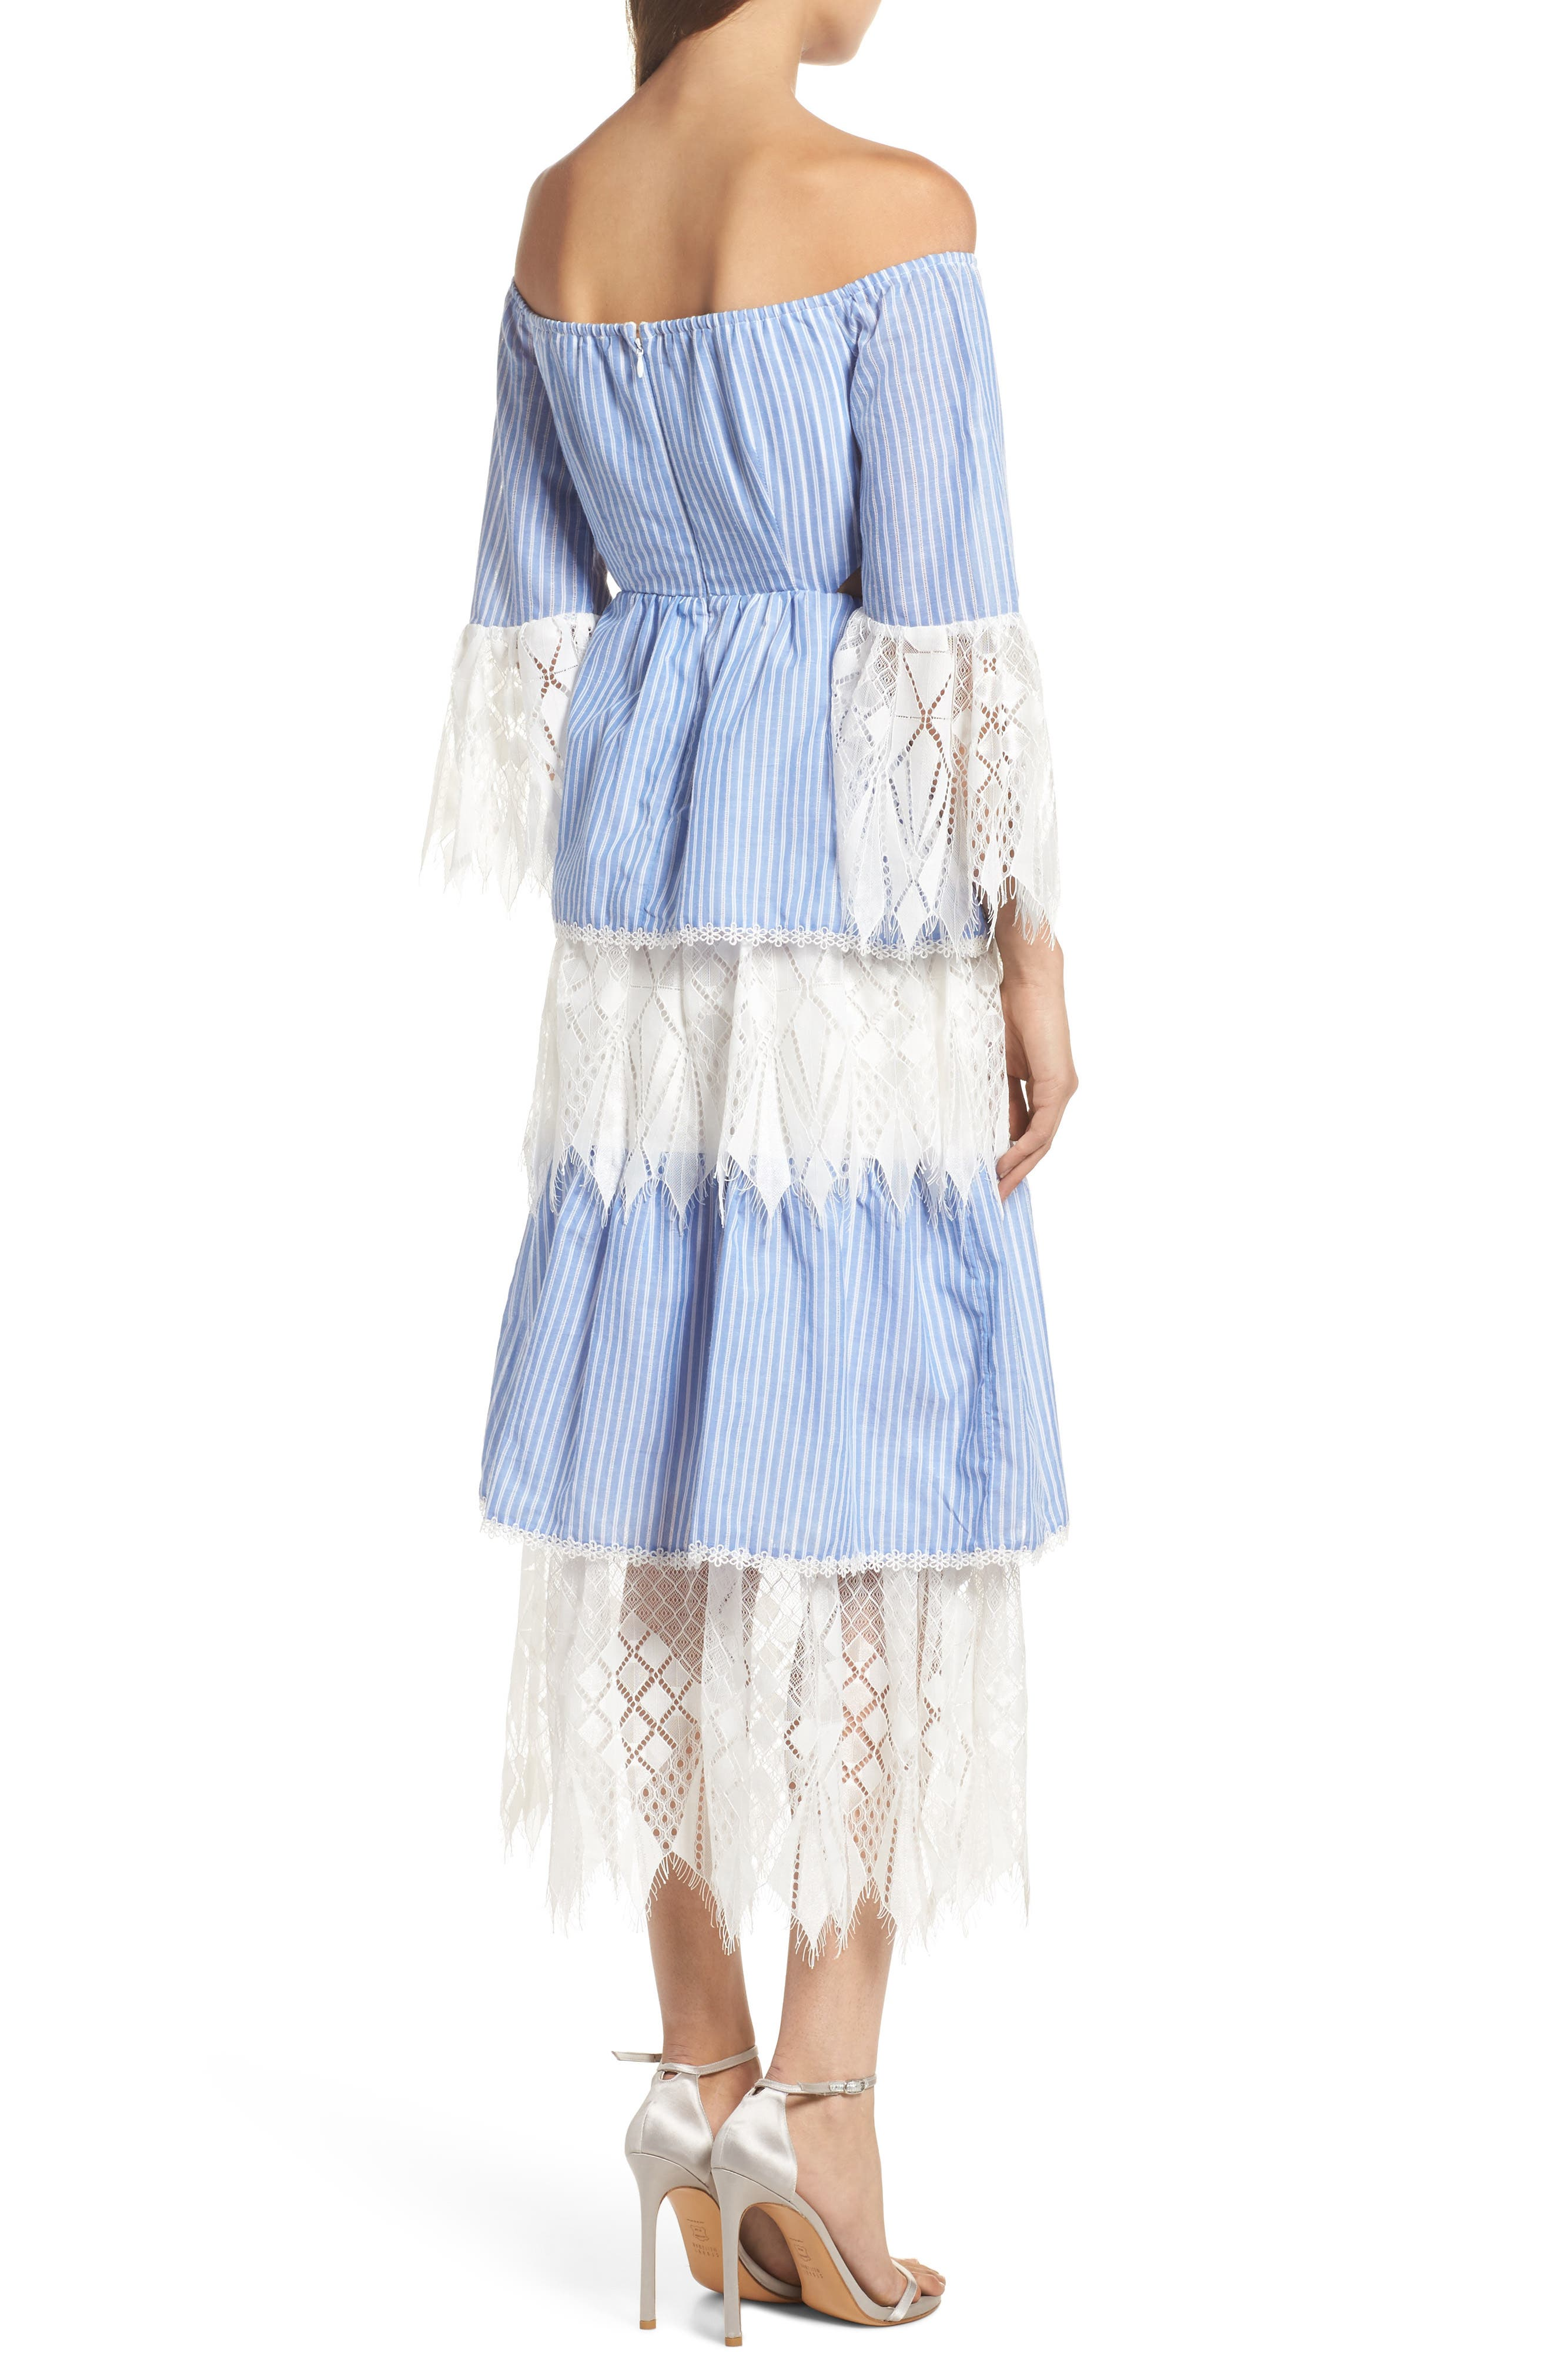 Addison Lace Tier Off the Shoulder Midi Dress,                             Alternate thumbnail 2, color,                             434